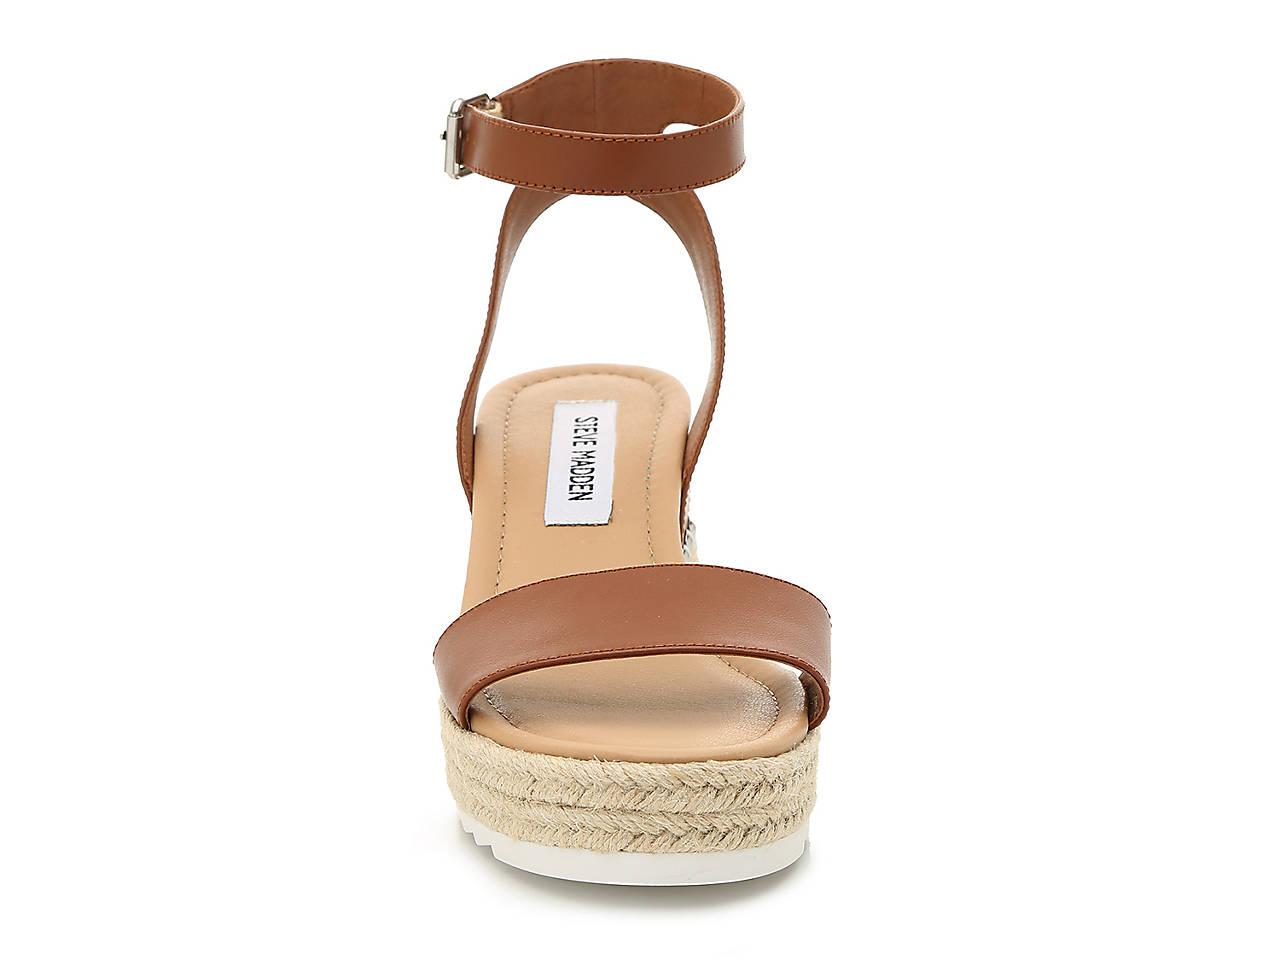 873d75b711d Jewel Espadrille Wedge Sandal